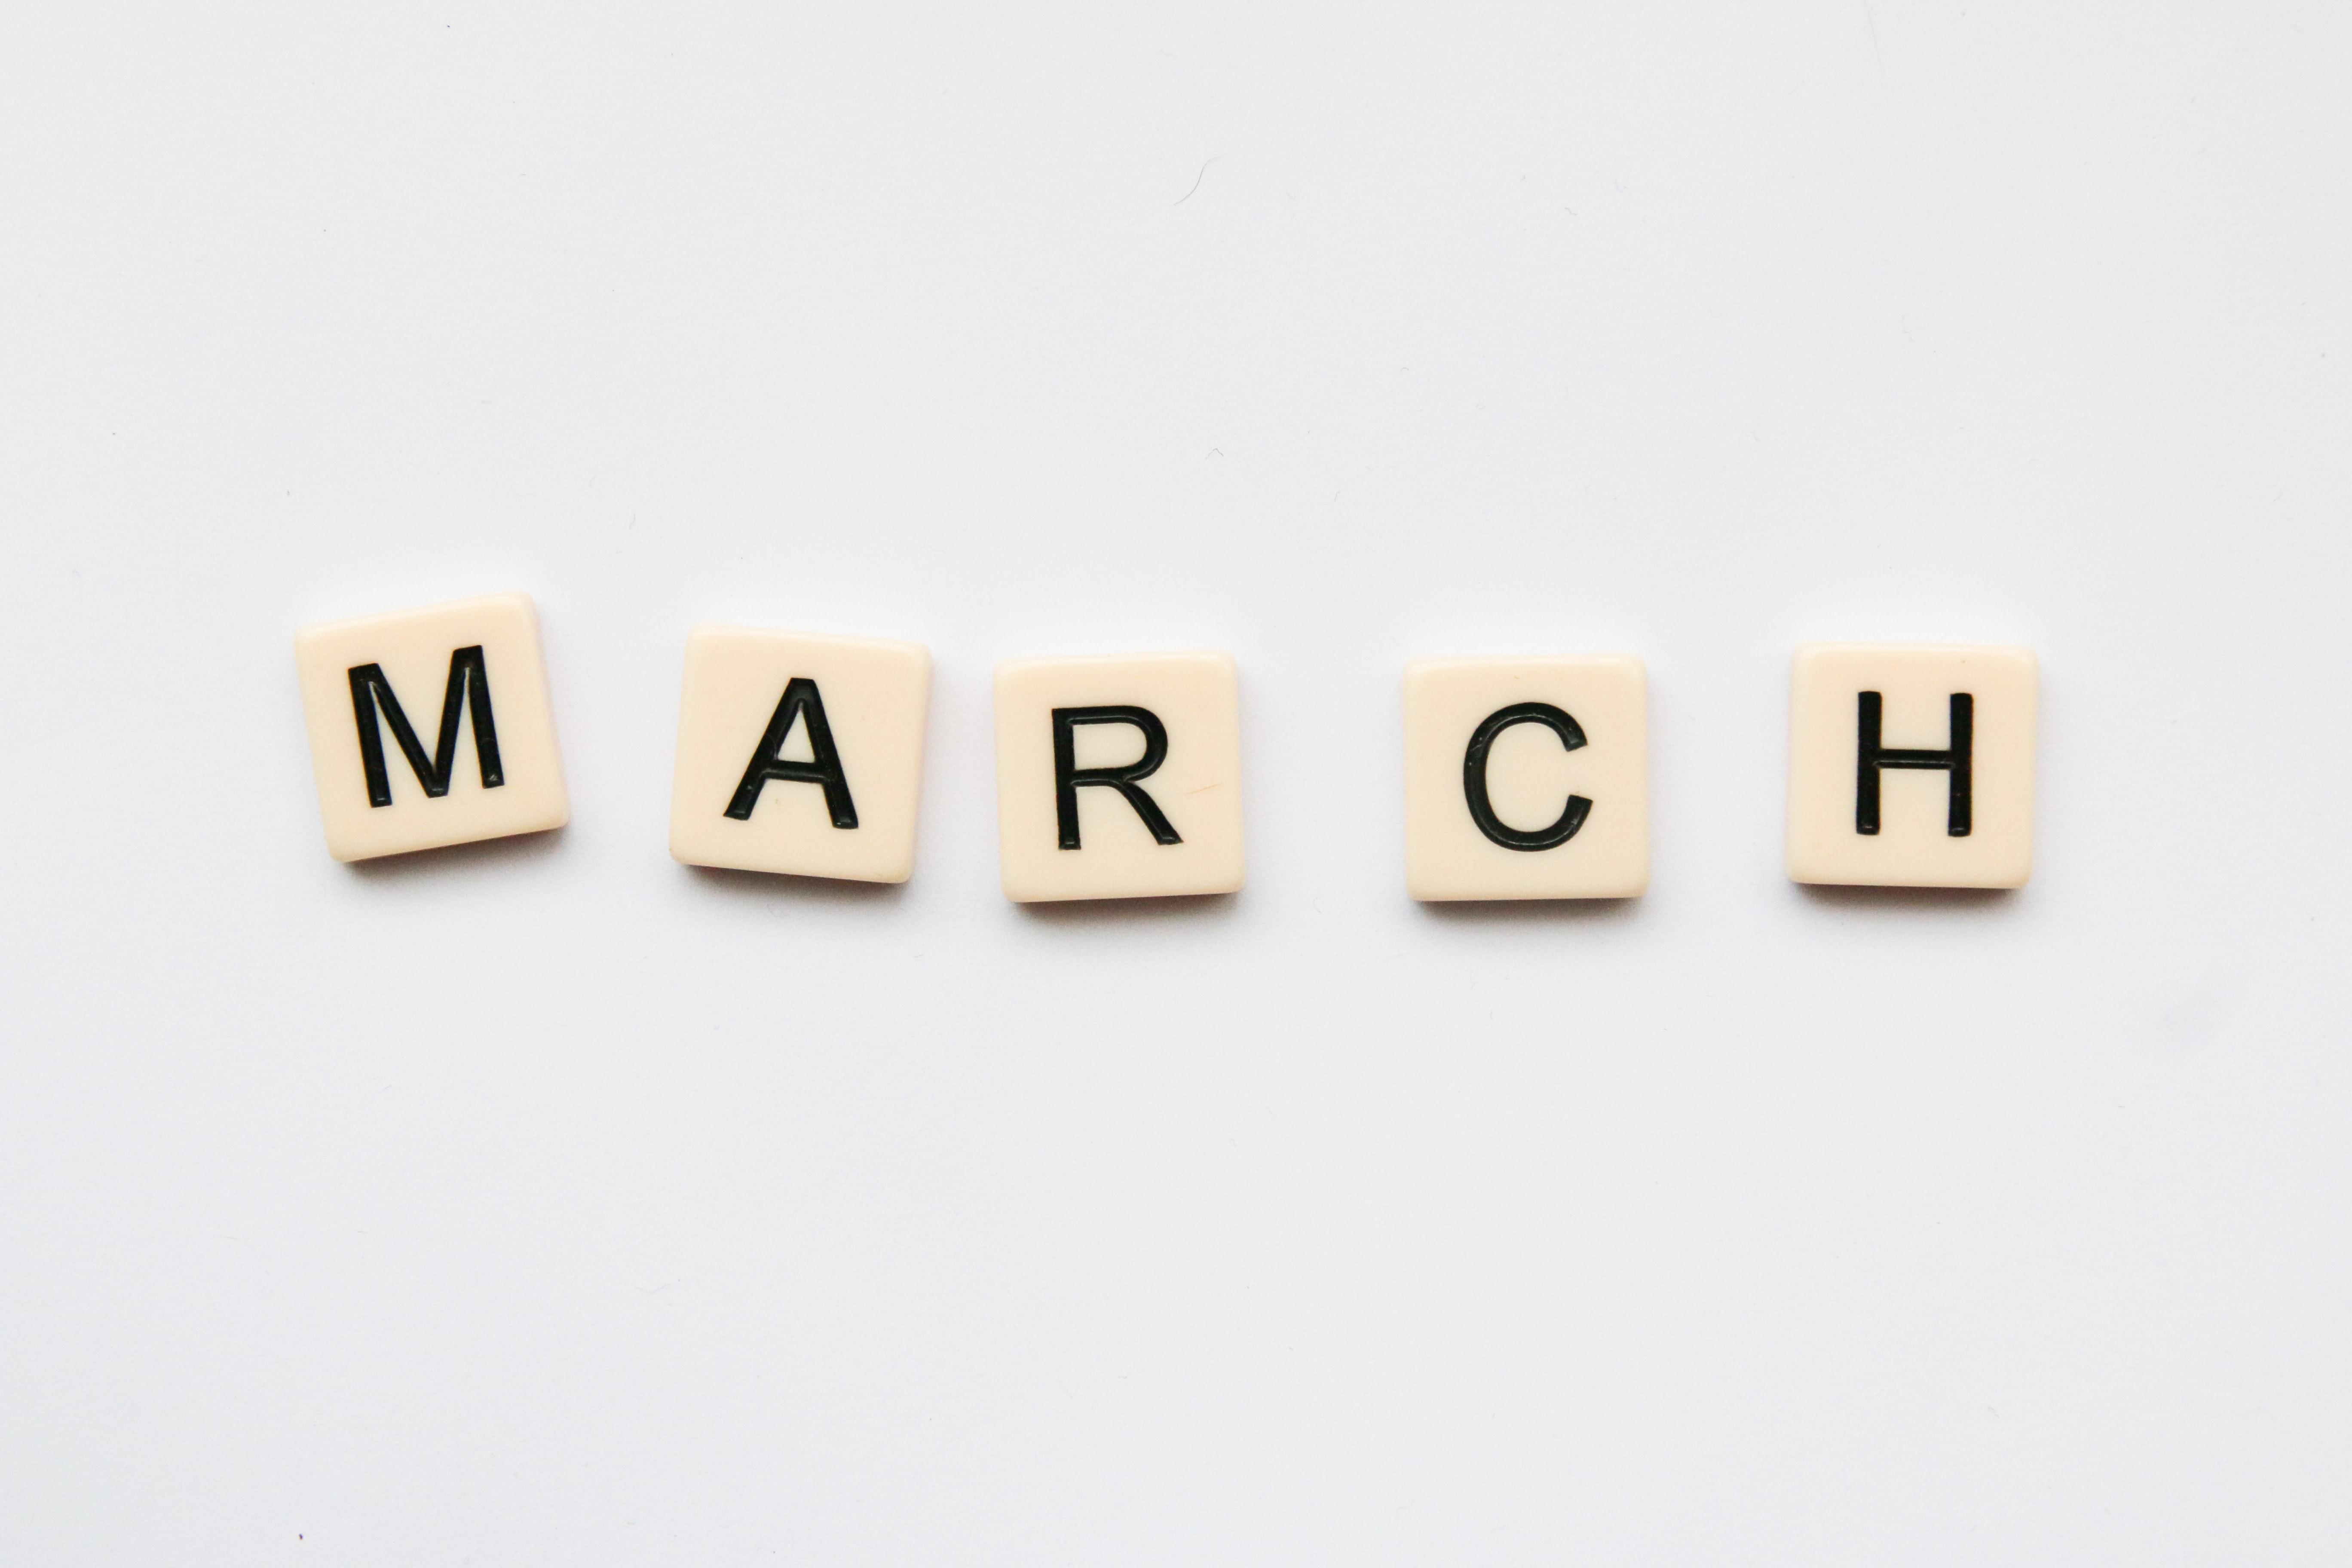 March Market Review Thumbnail